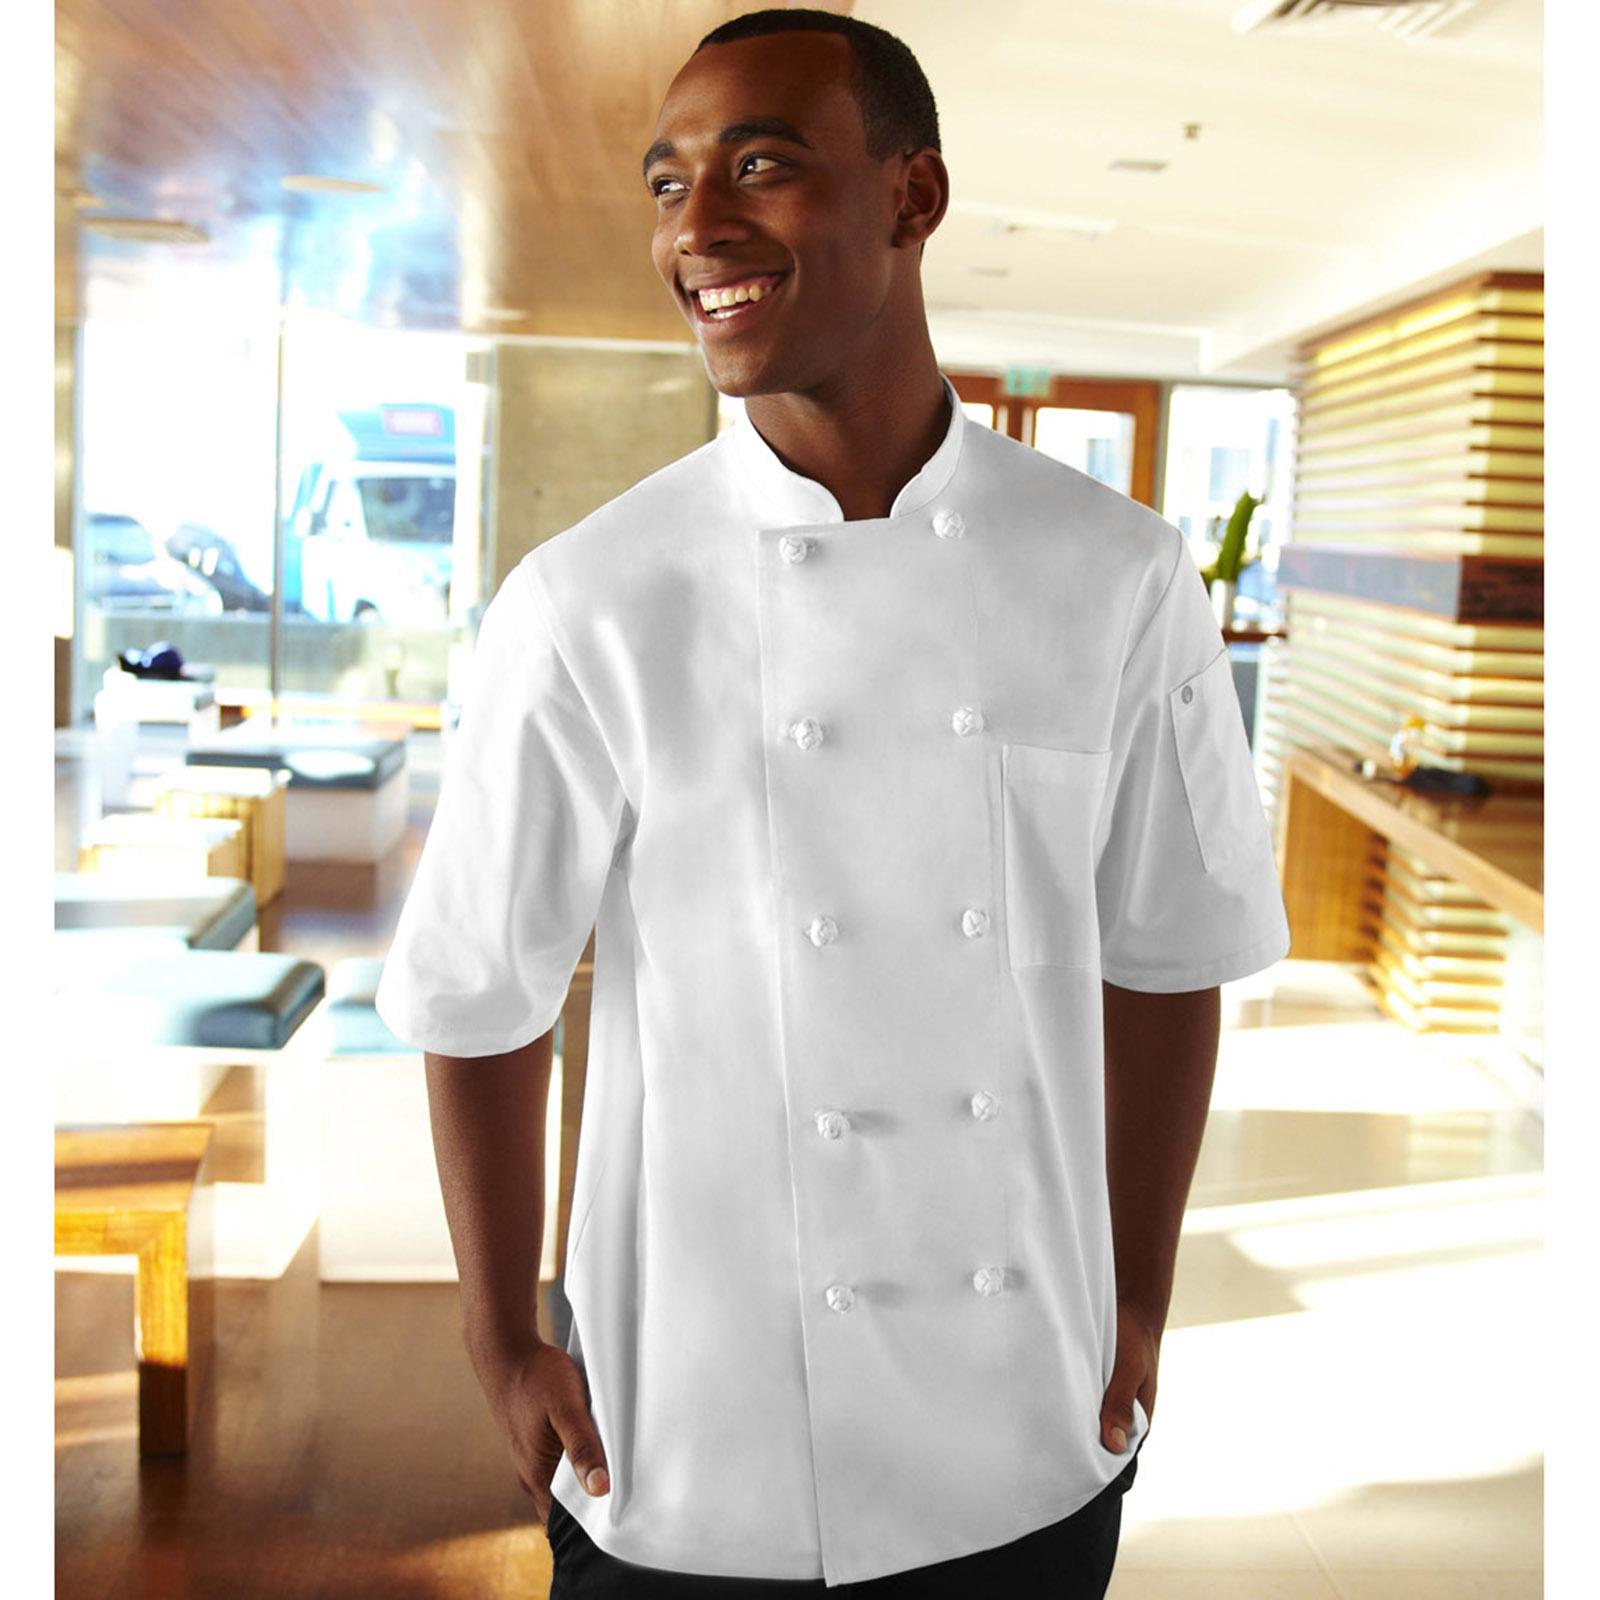 Chef Works KNSSWHT2XL chef's coat